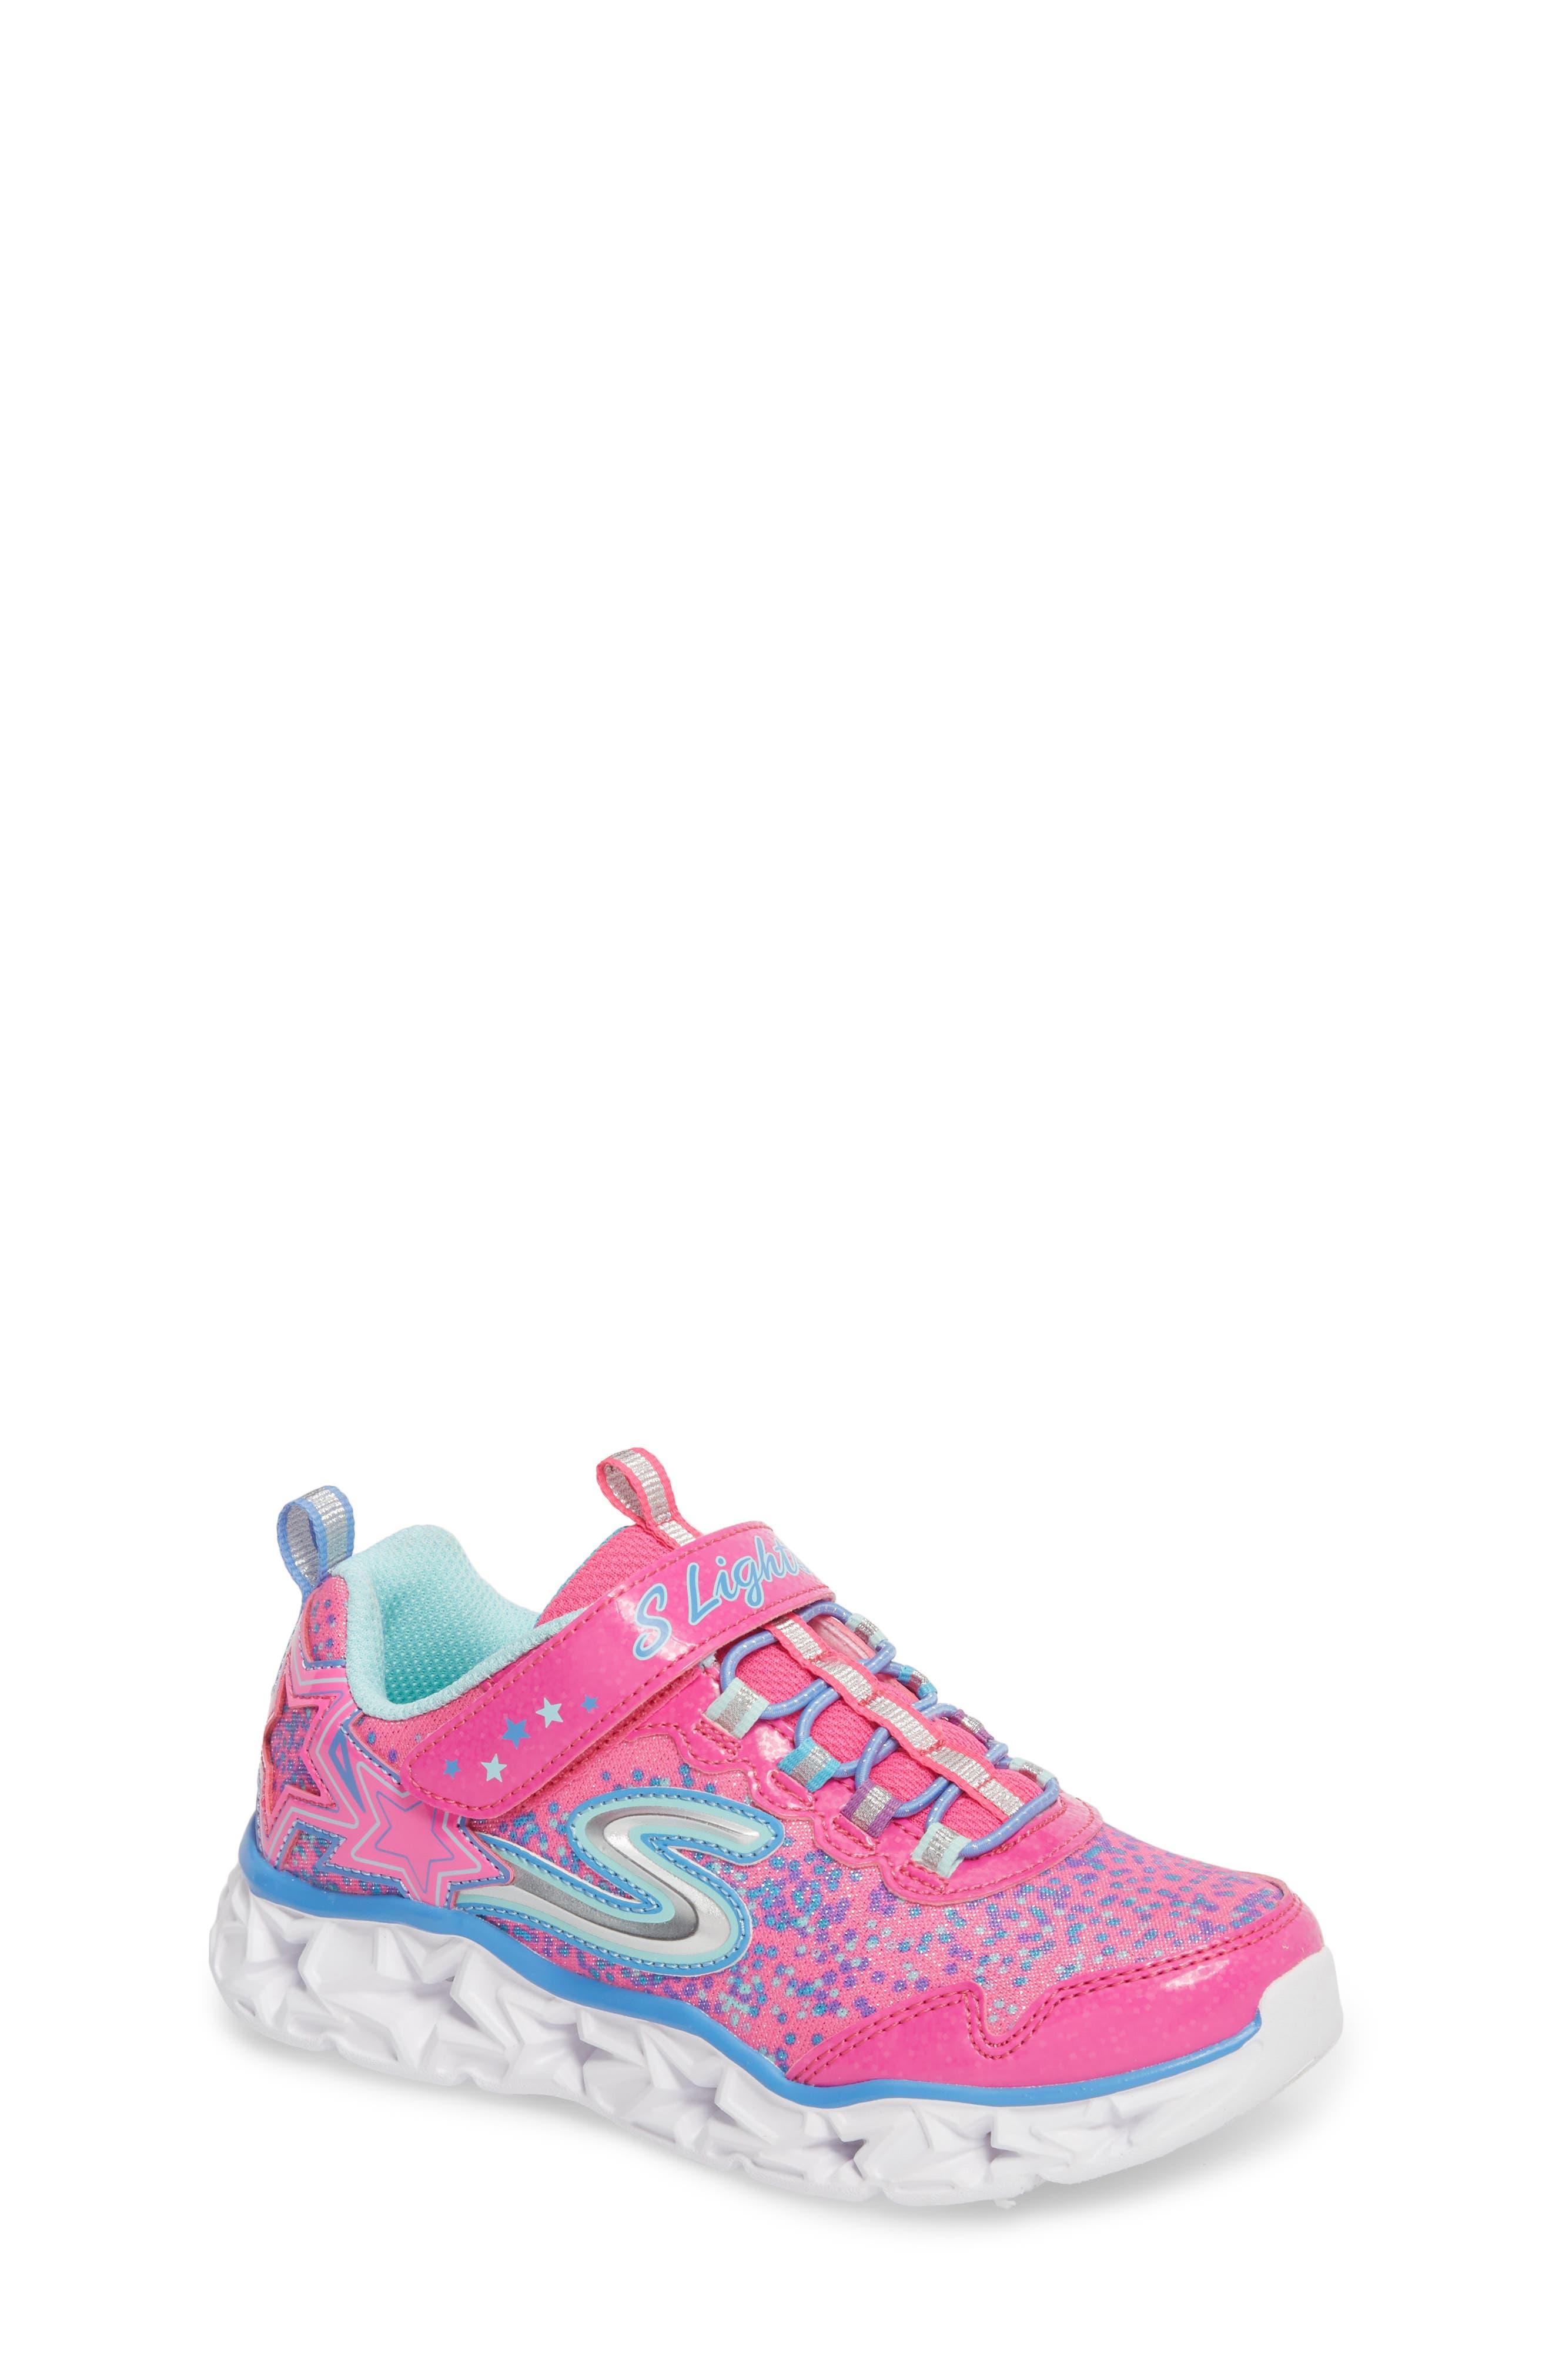 SKECHERS Galaxy Lights Sneakers (Toddler & Little Kid)